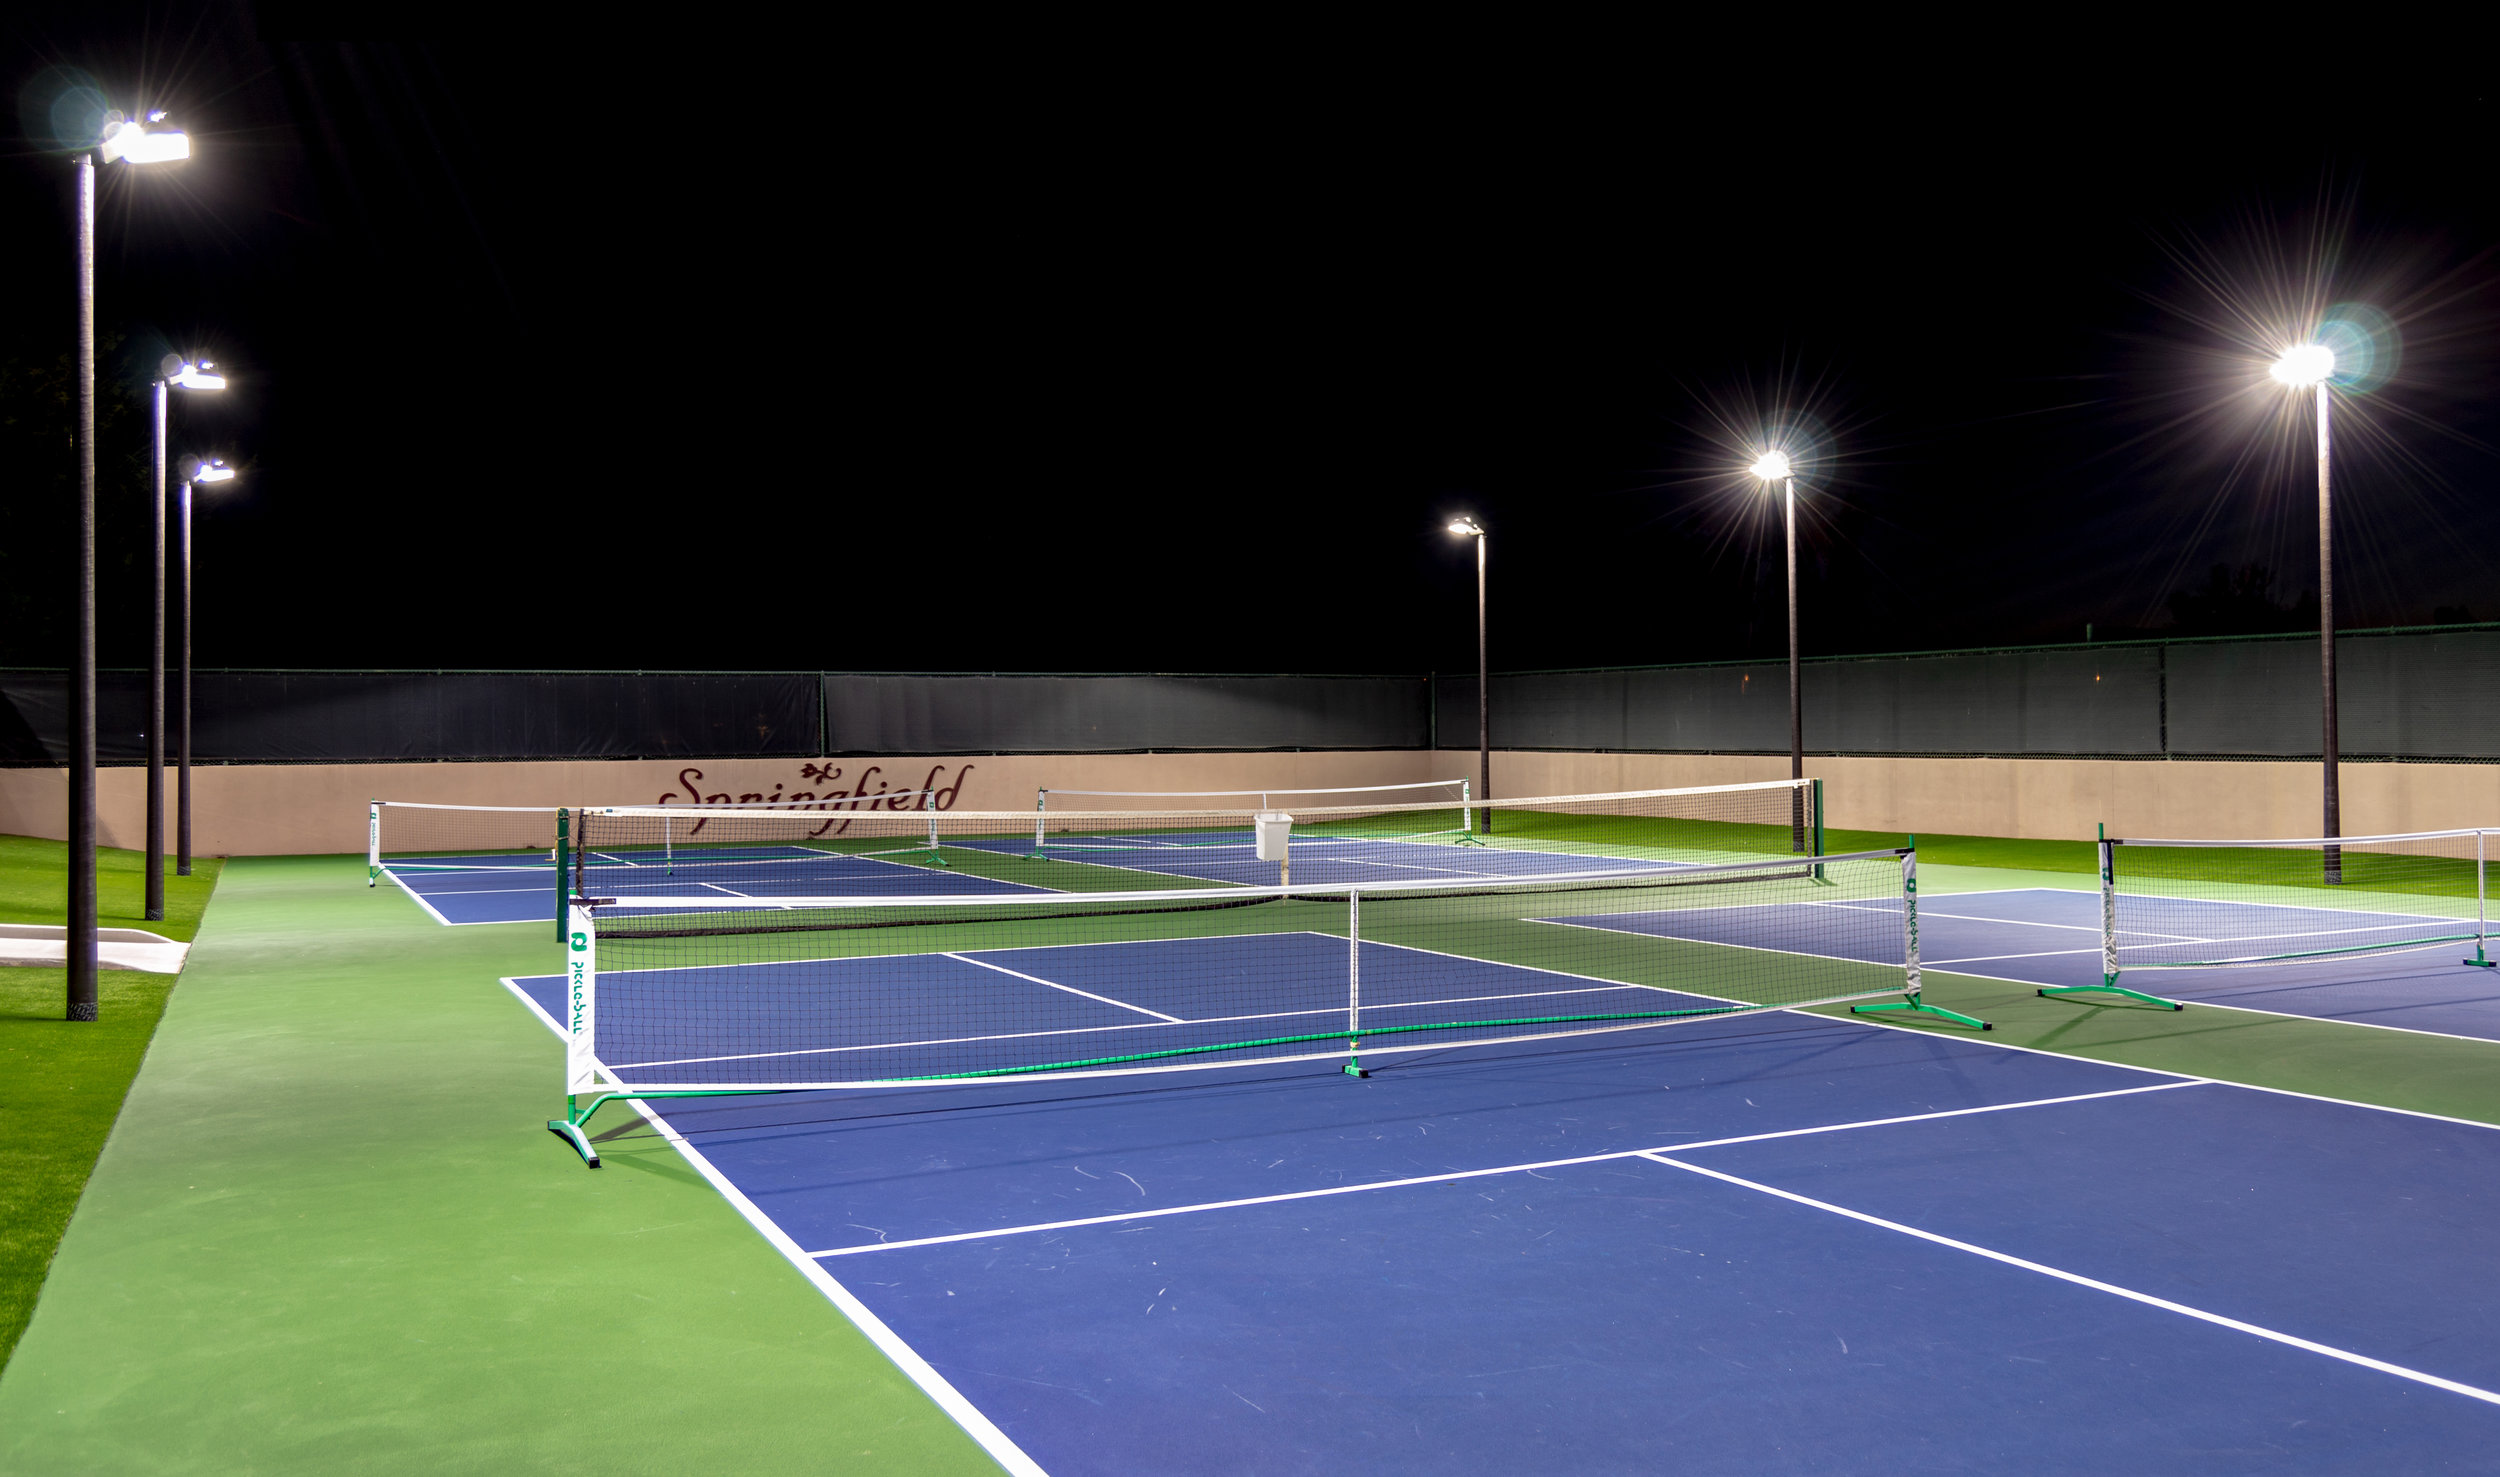 courts-bc.jpg